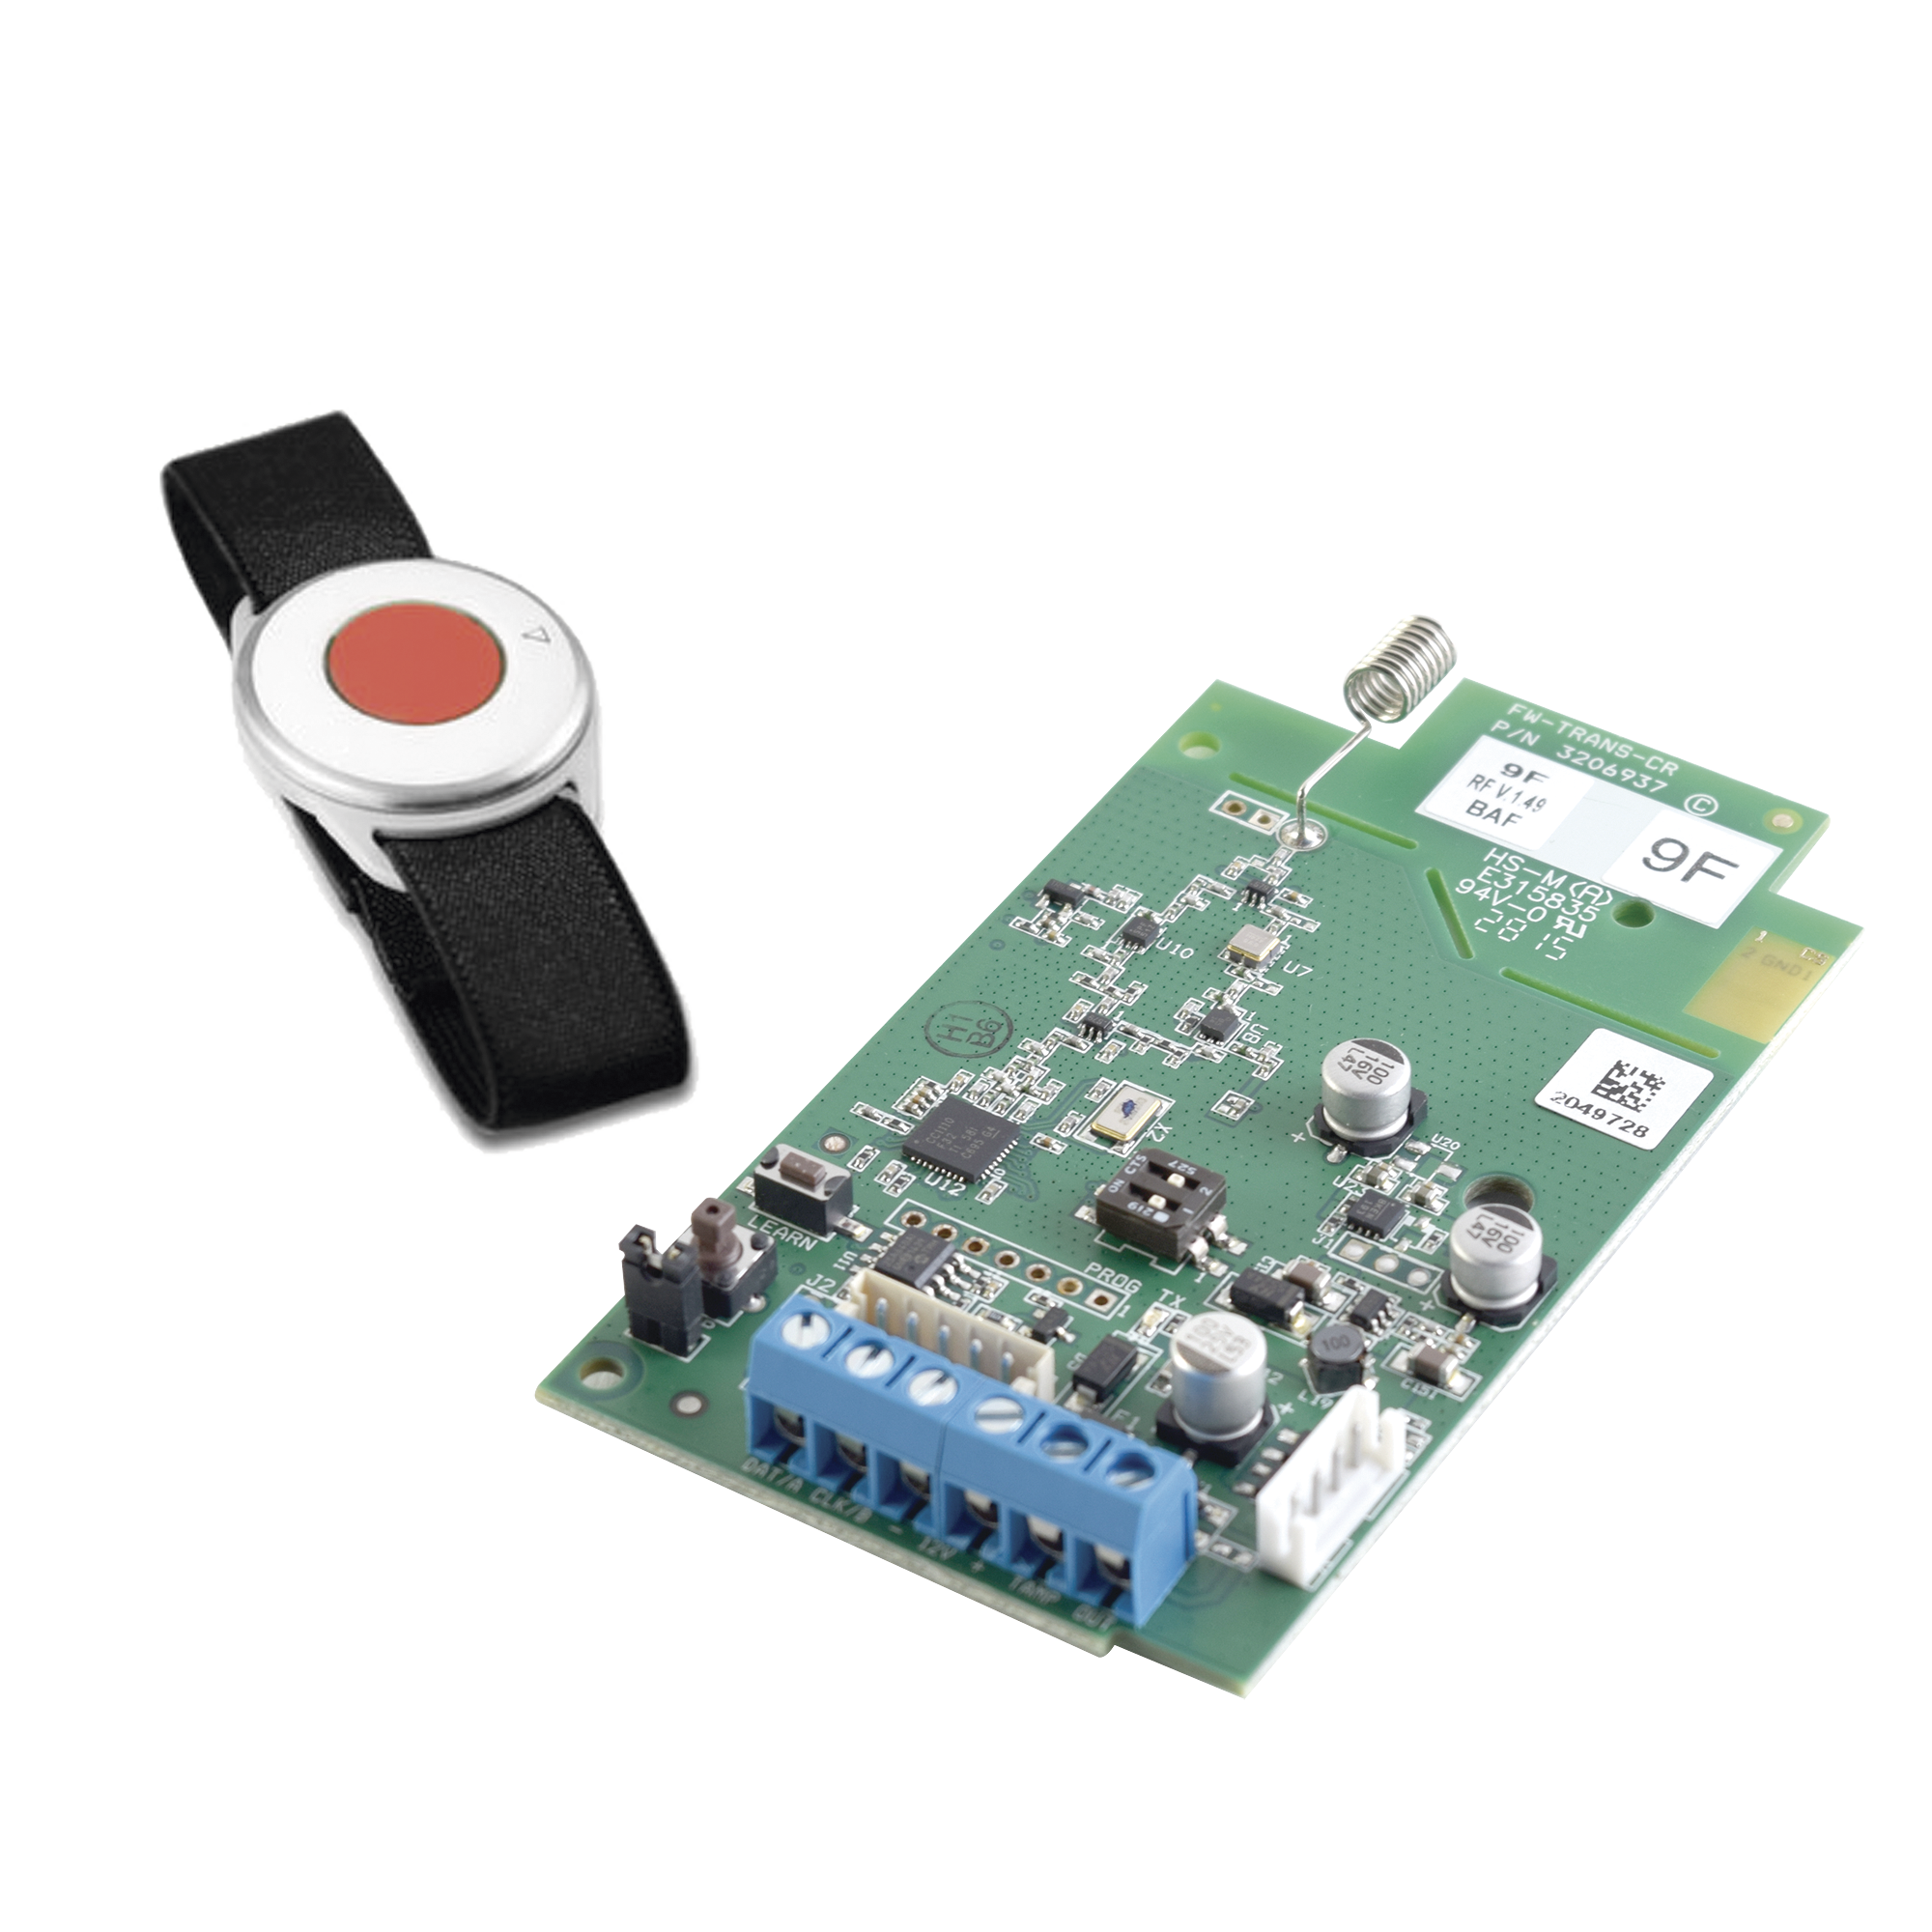 Kit de Transceptor Inalámbrico 916MHz. 2 Vías y Botón de Pánico compatible con panel Crow